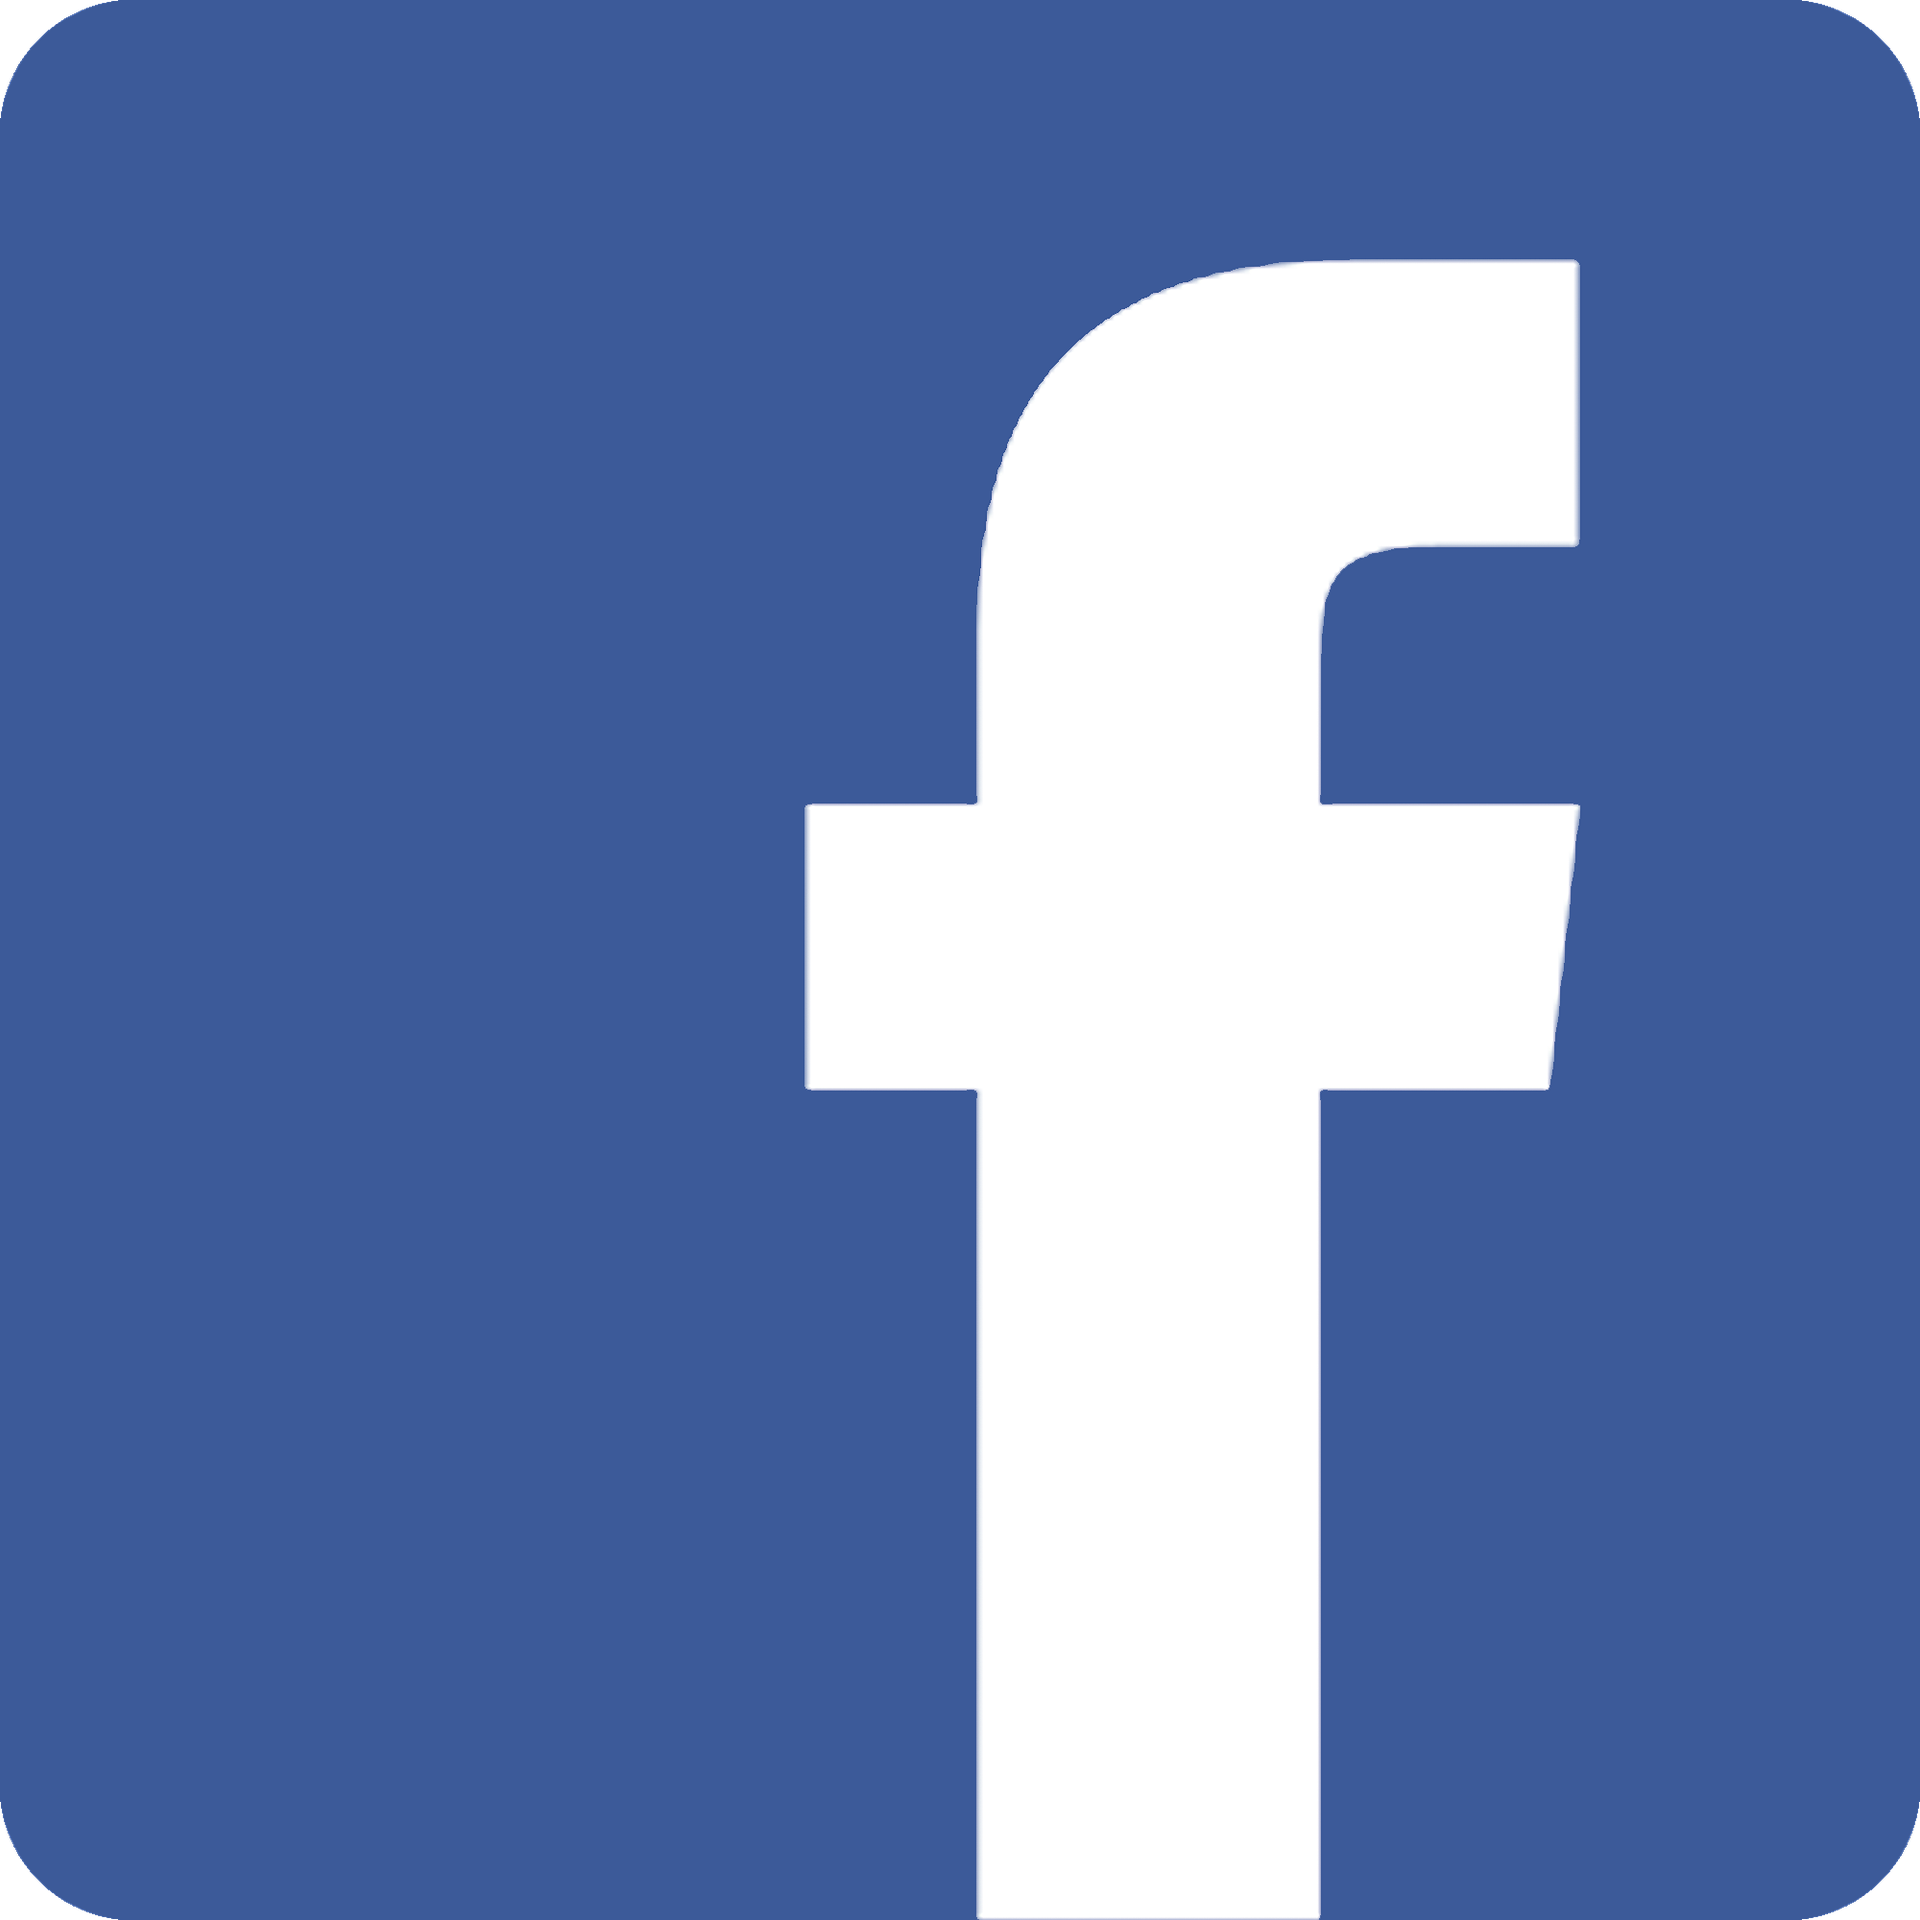 Facebook グループ 削除 方法 - englndwk